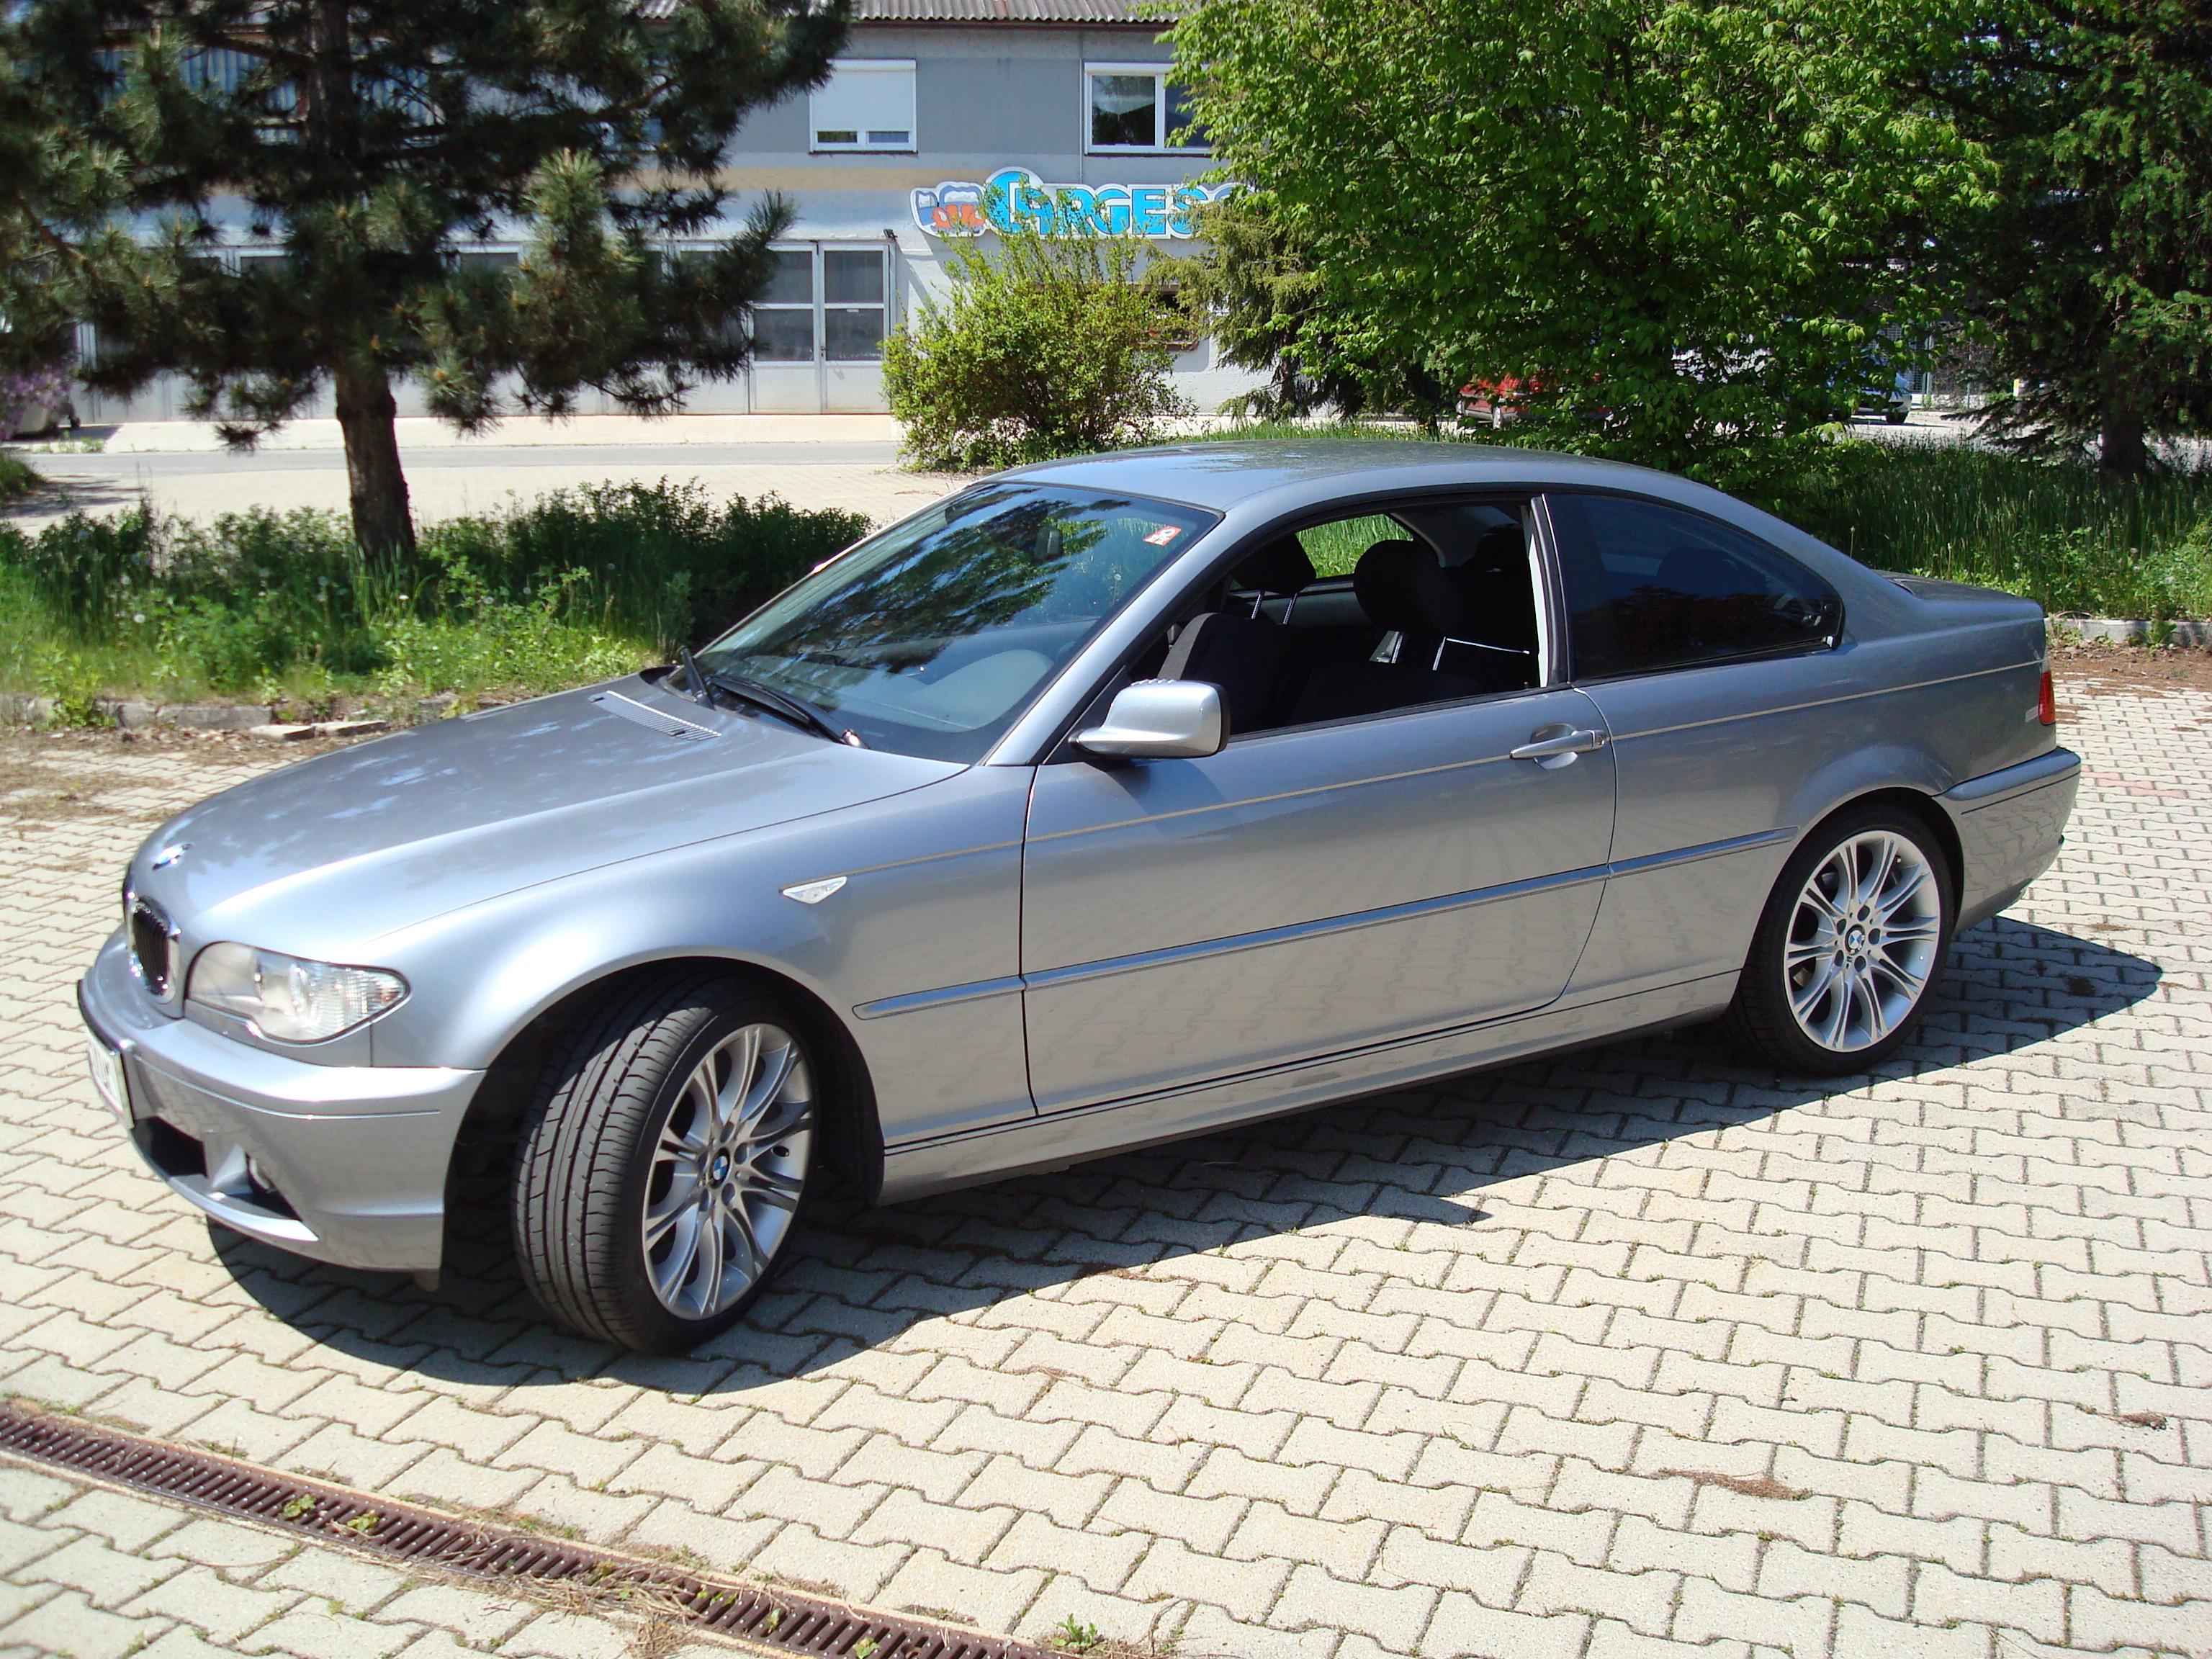 BMW 318Ci 2.0 (E46)